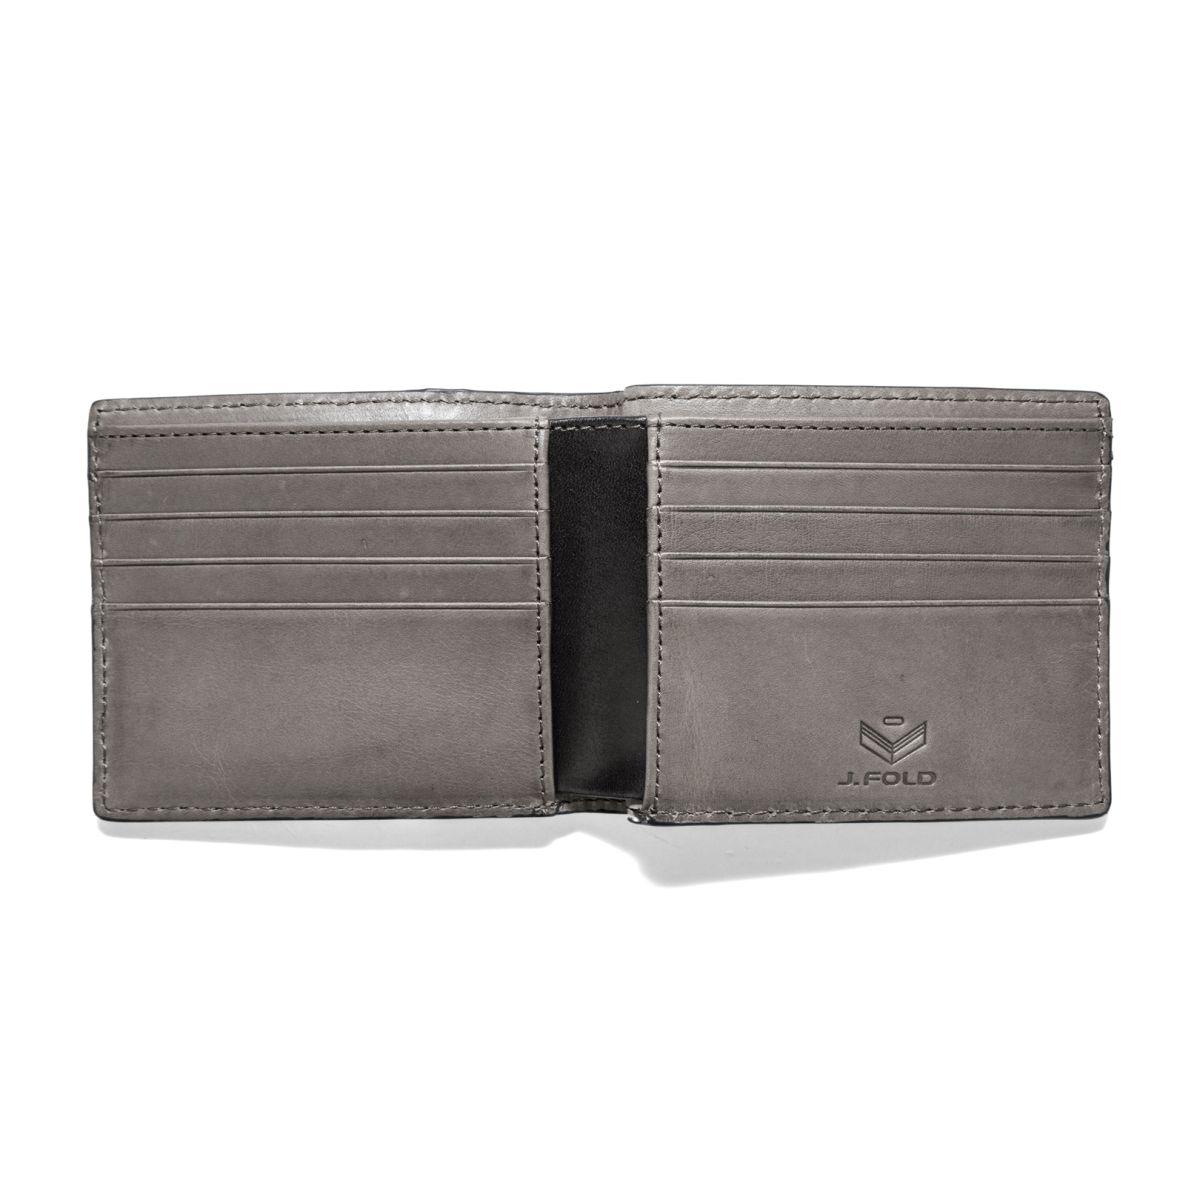 J.FOLD Roadster Leather Wallet - Black/Grey